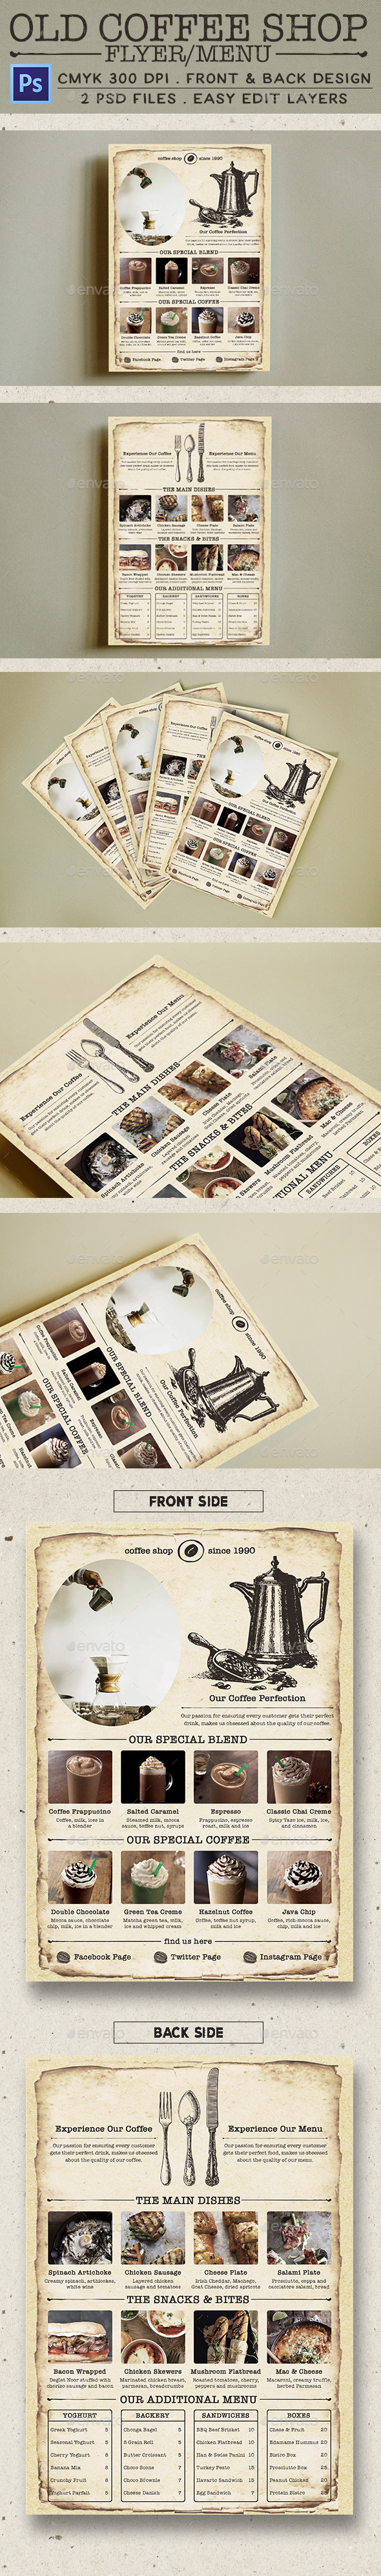 Old Coffee Shop Flyer - Food Menus Print Templates